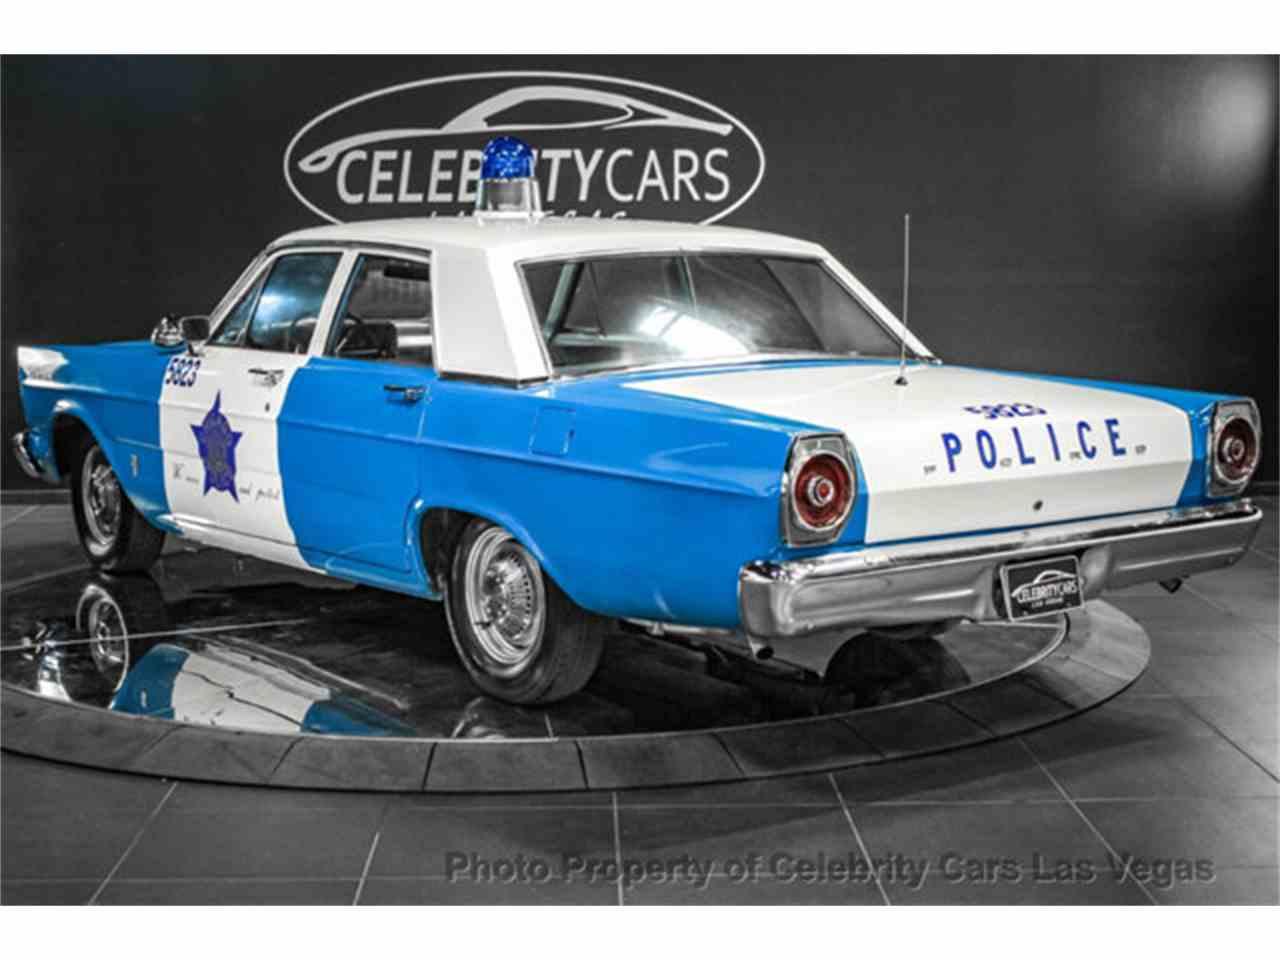 1965 Ford Police Car for Sale | ClassicCars.com | CC-1064424